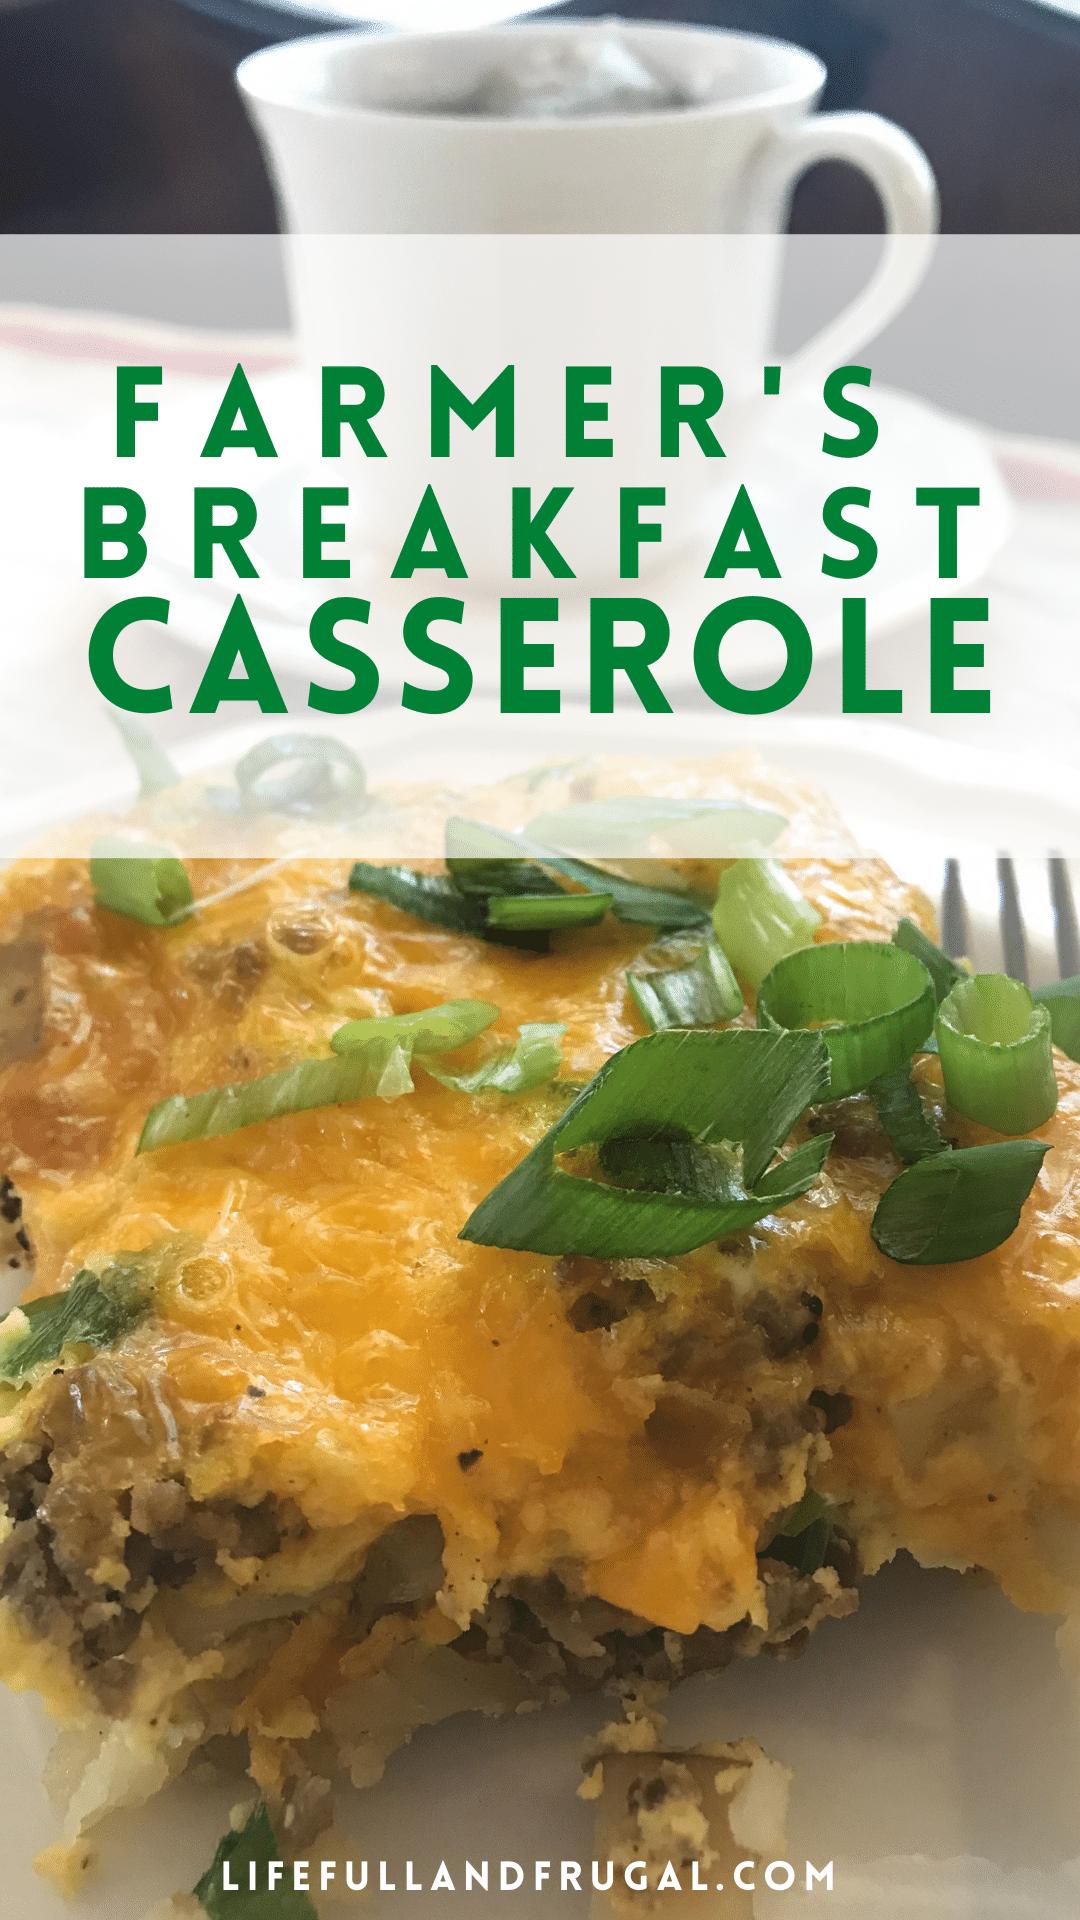 Farmer's Breakfast Casserole - Life Full and Frugal